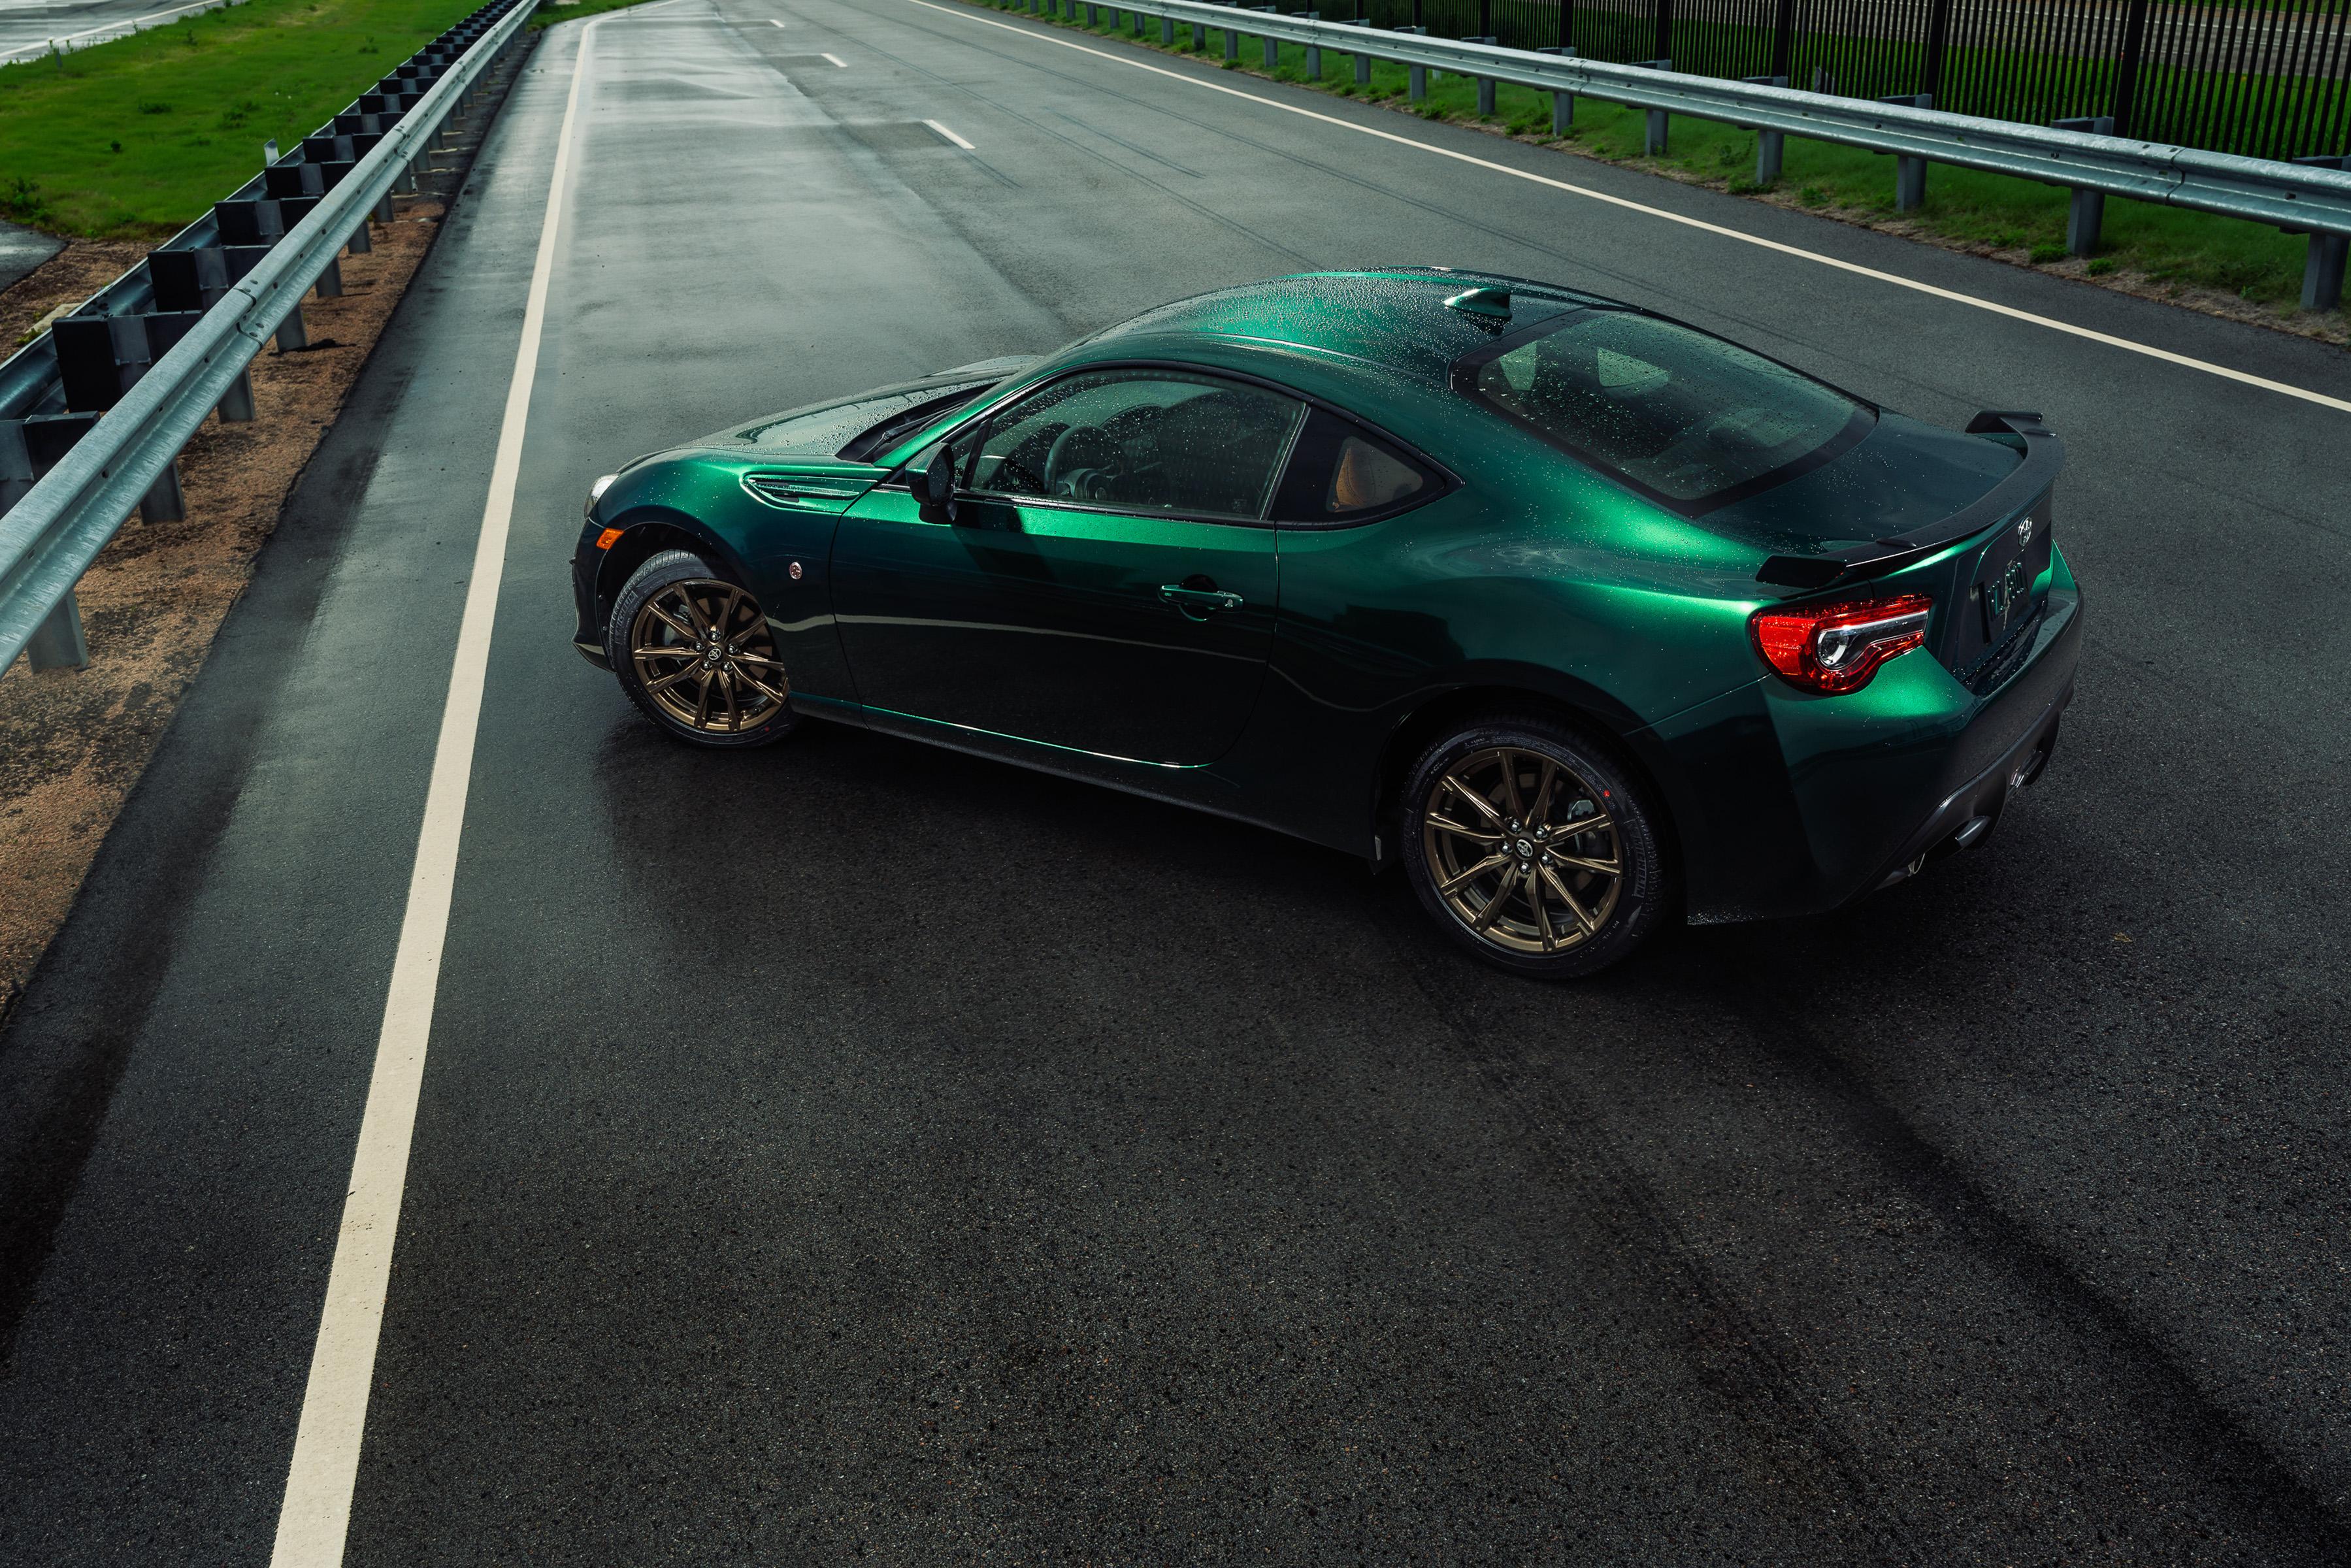 Car Green Car Sport Car Toyota Toyota 86 Vehicle 3598x2400